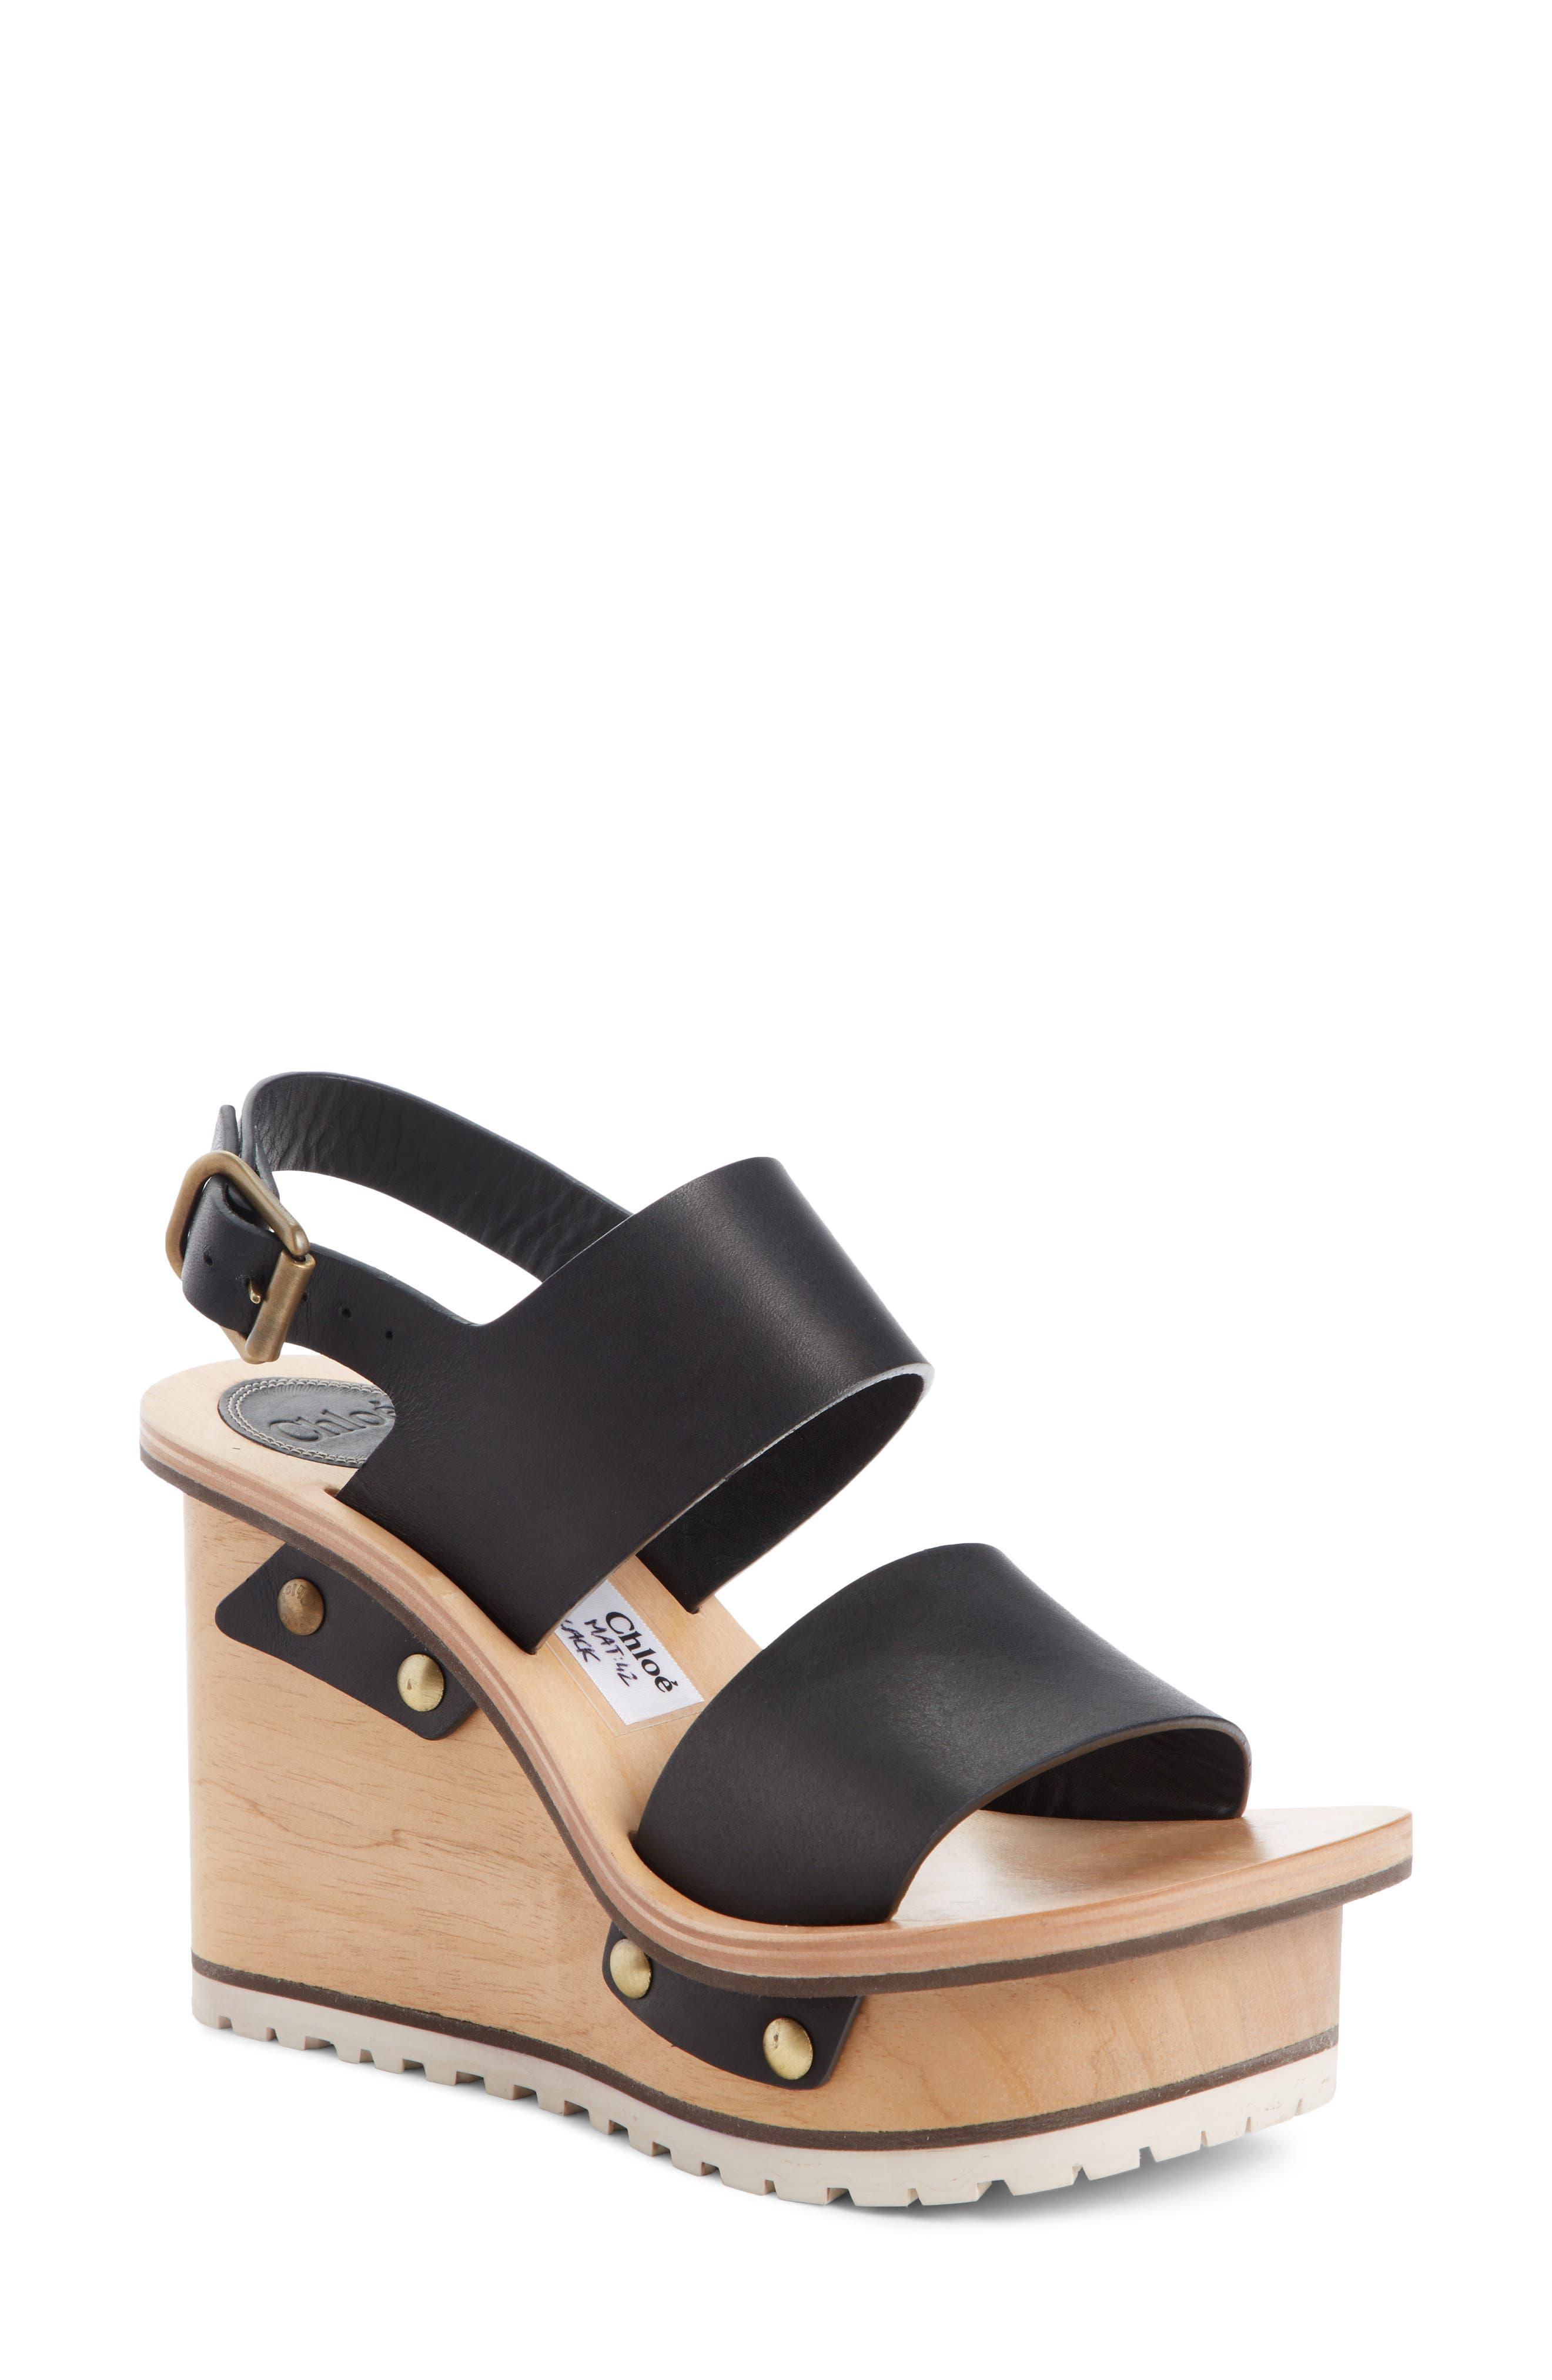 Chloe Valentine Platform Wedge Sandal